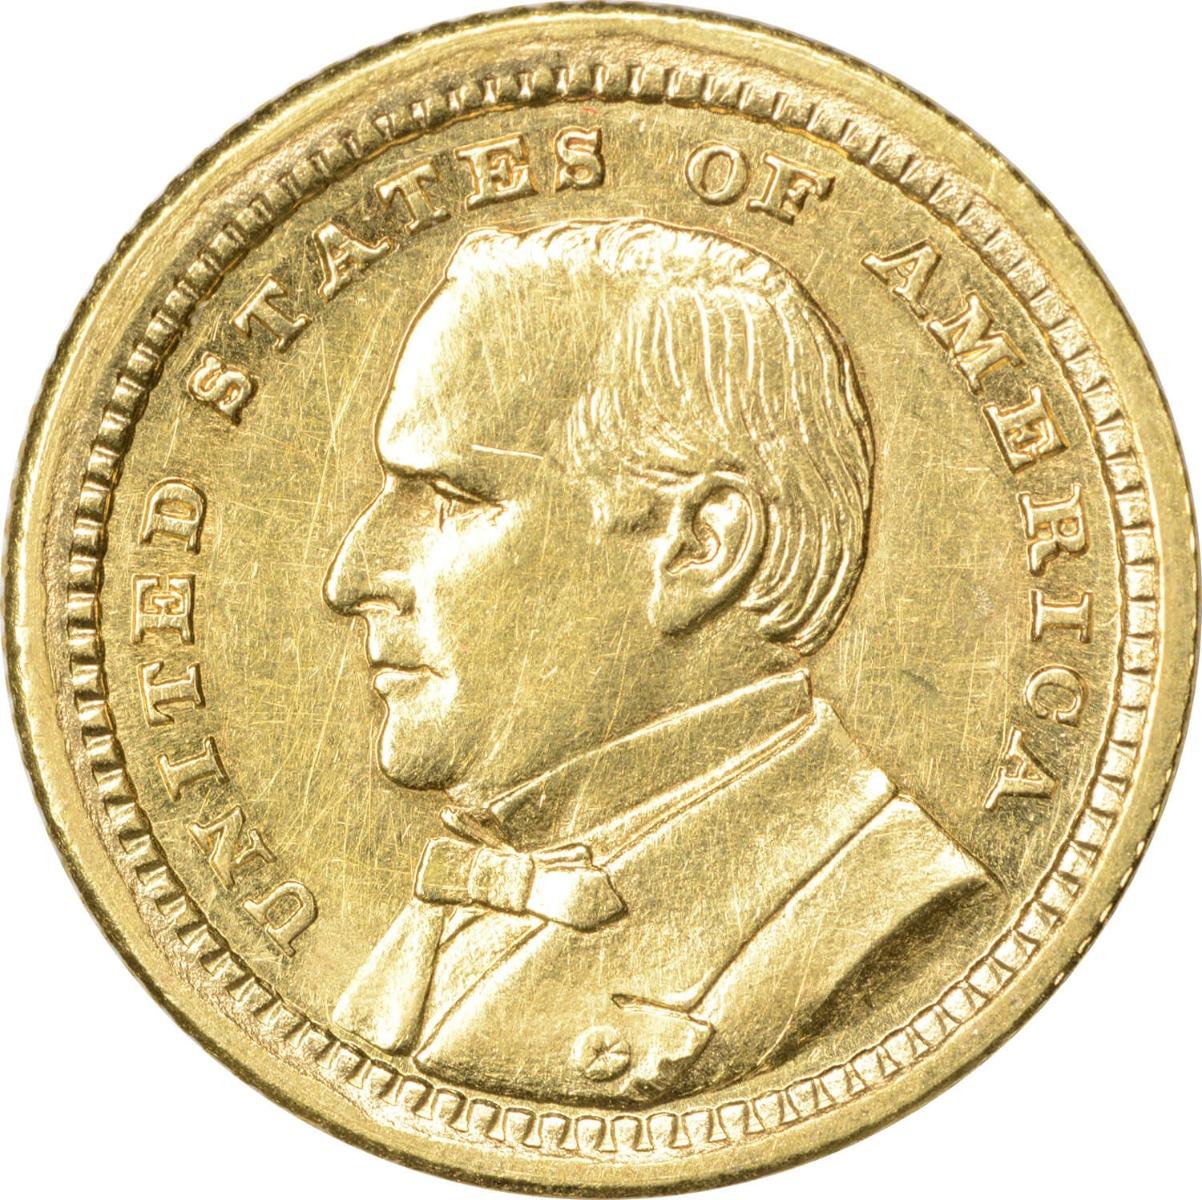 1903 LA Purchase-McKinley $1 Gold, AU, Uncertified